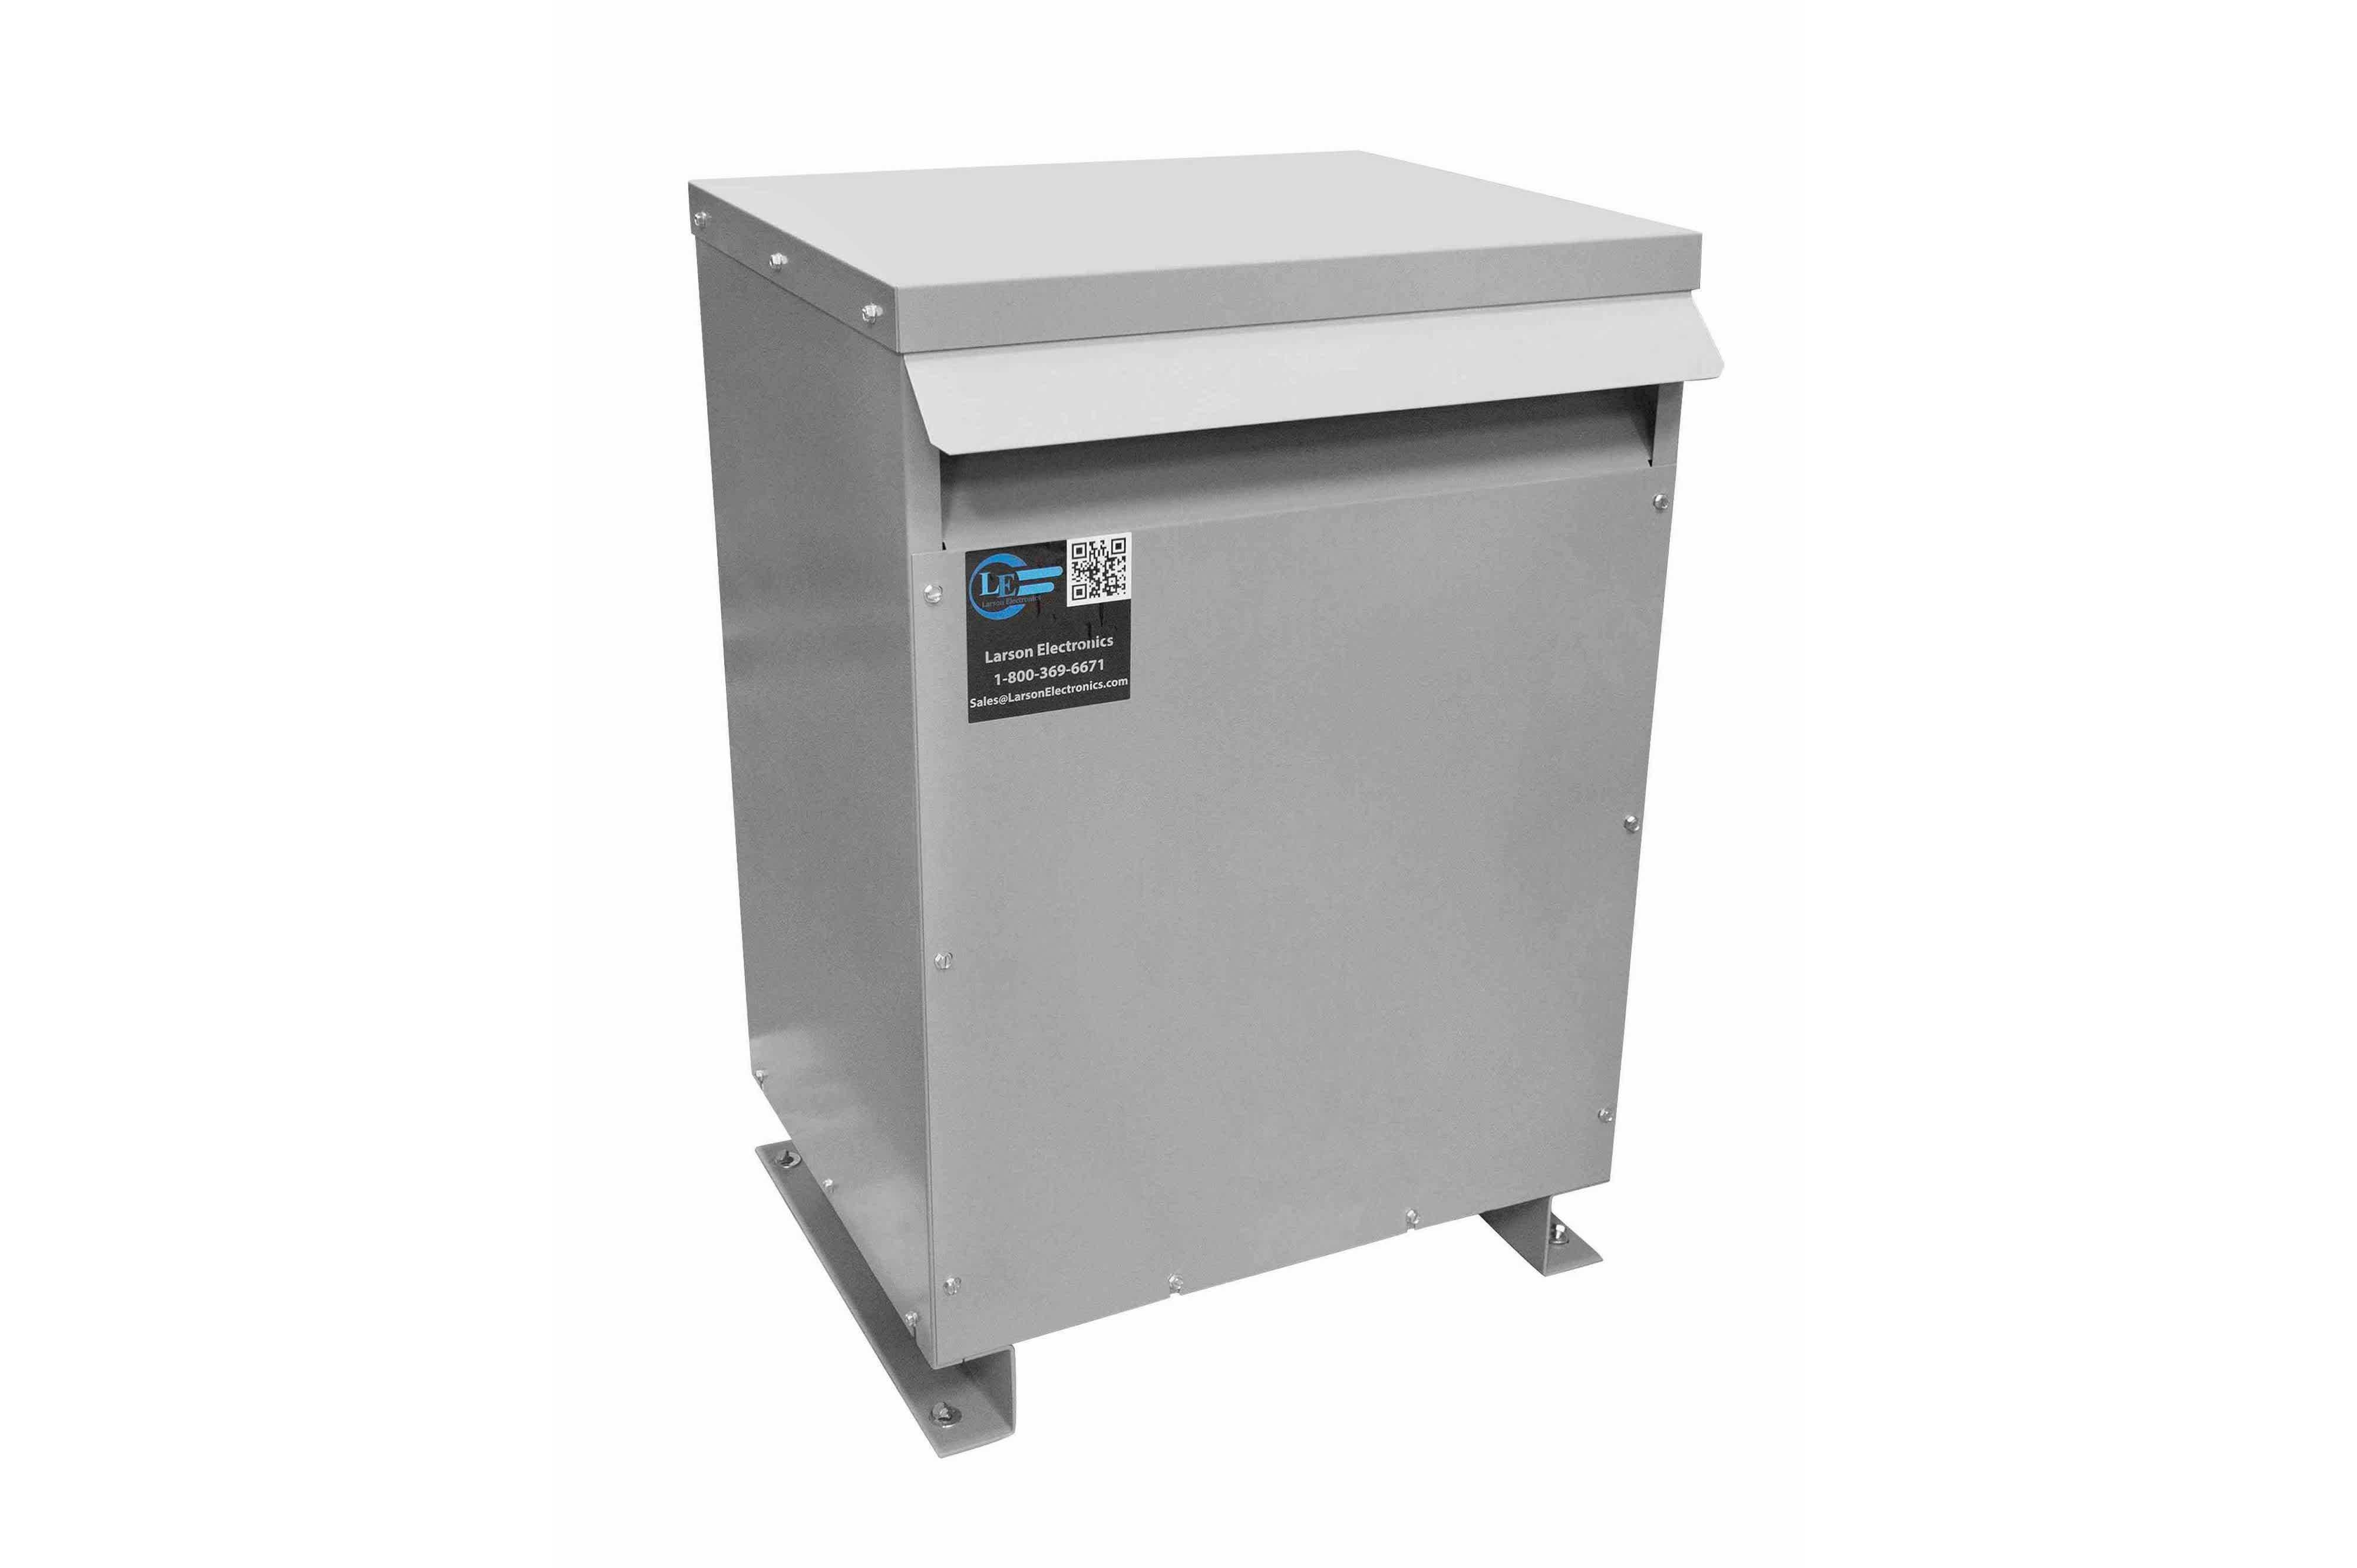 125 kVA 3PH Isolation Transformer, 480V Wye Primary, 480Y/277 Wye-N Secondary, N3R, Ventilated, 60 Hz